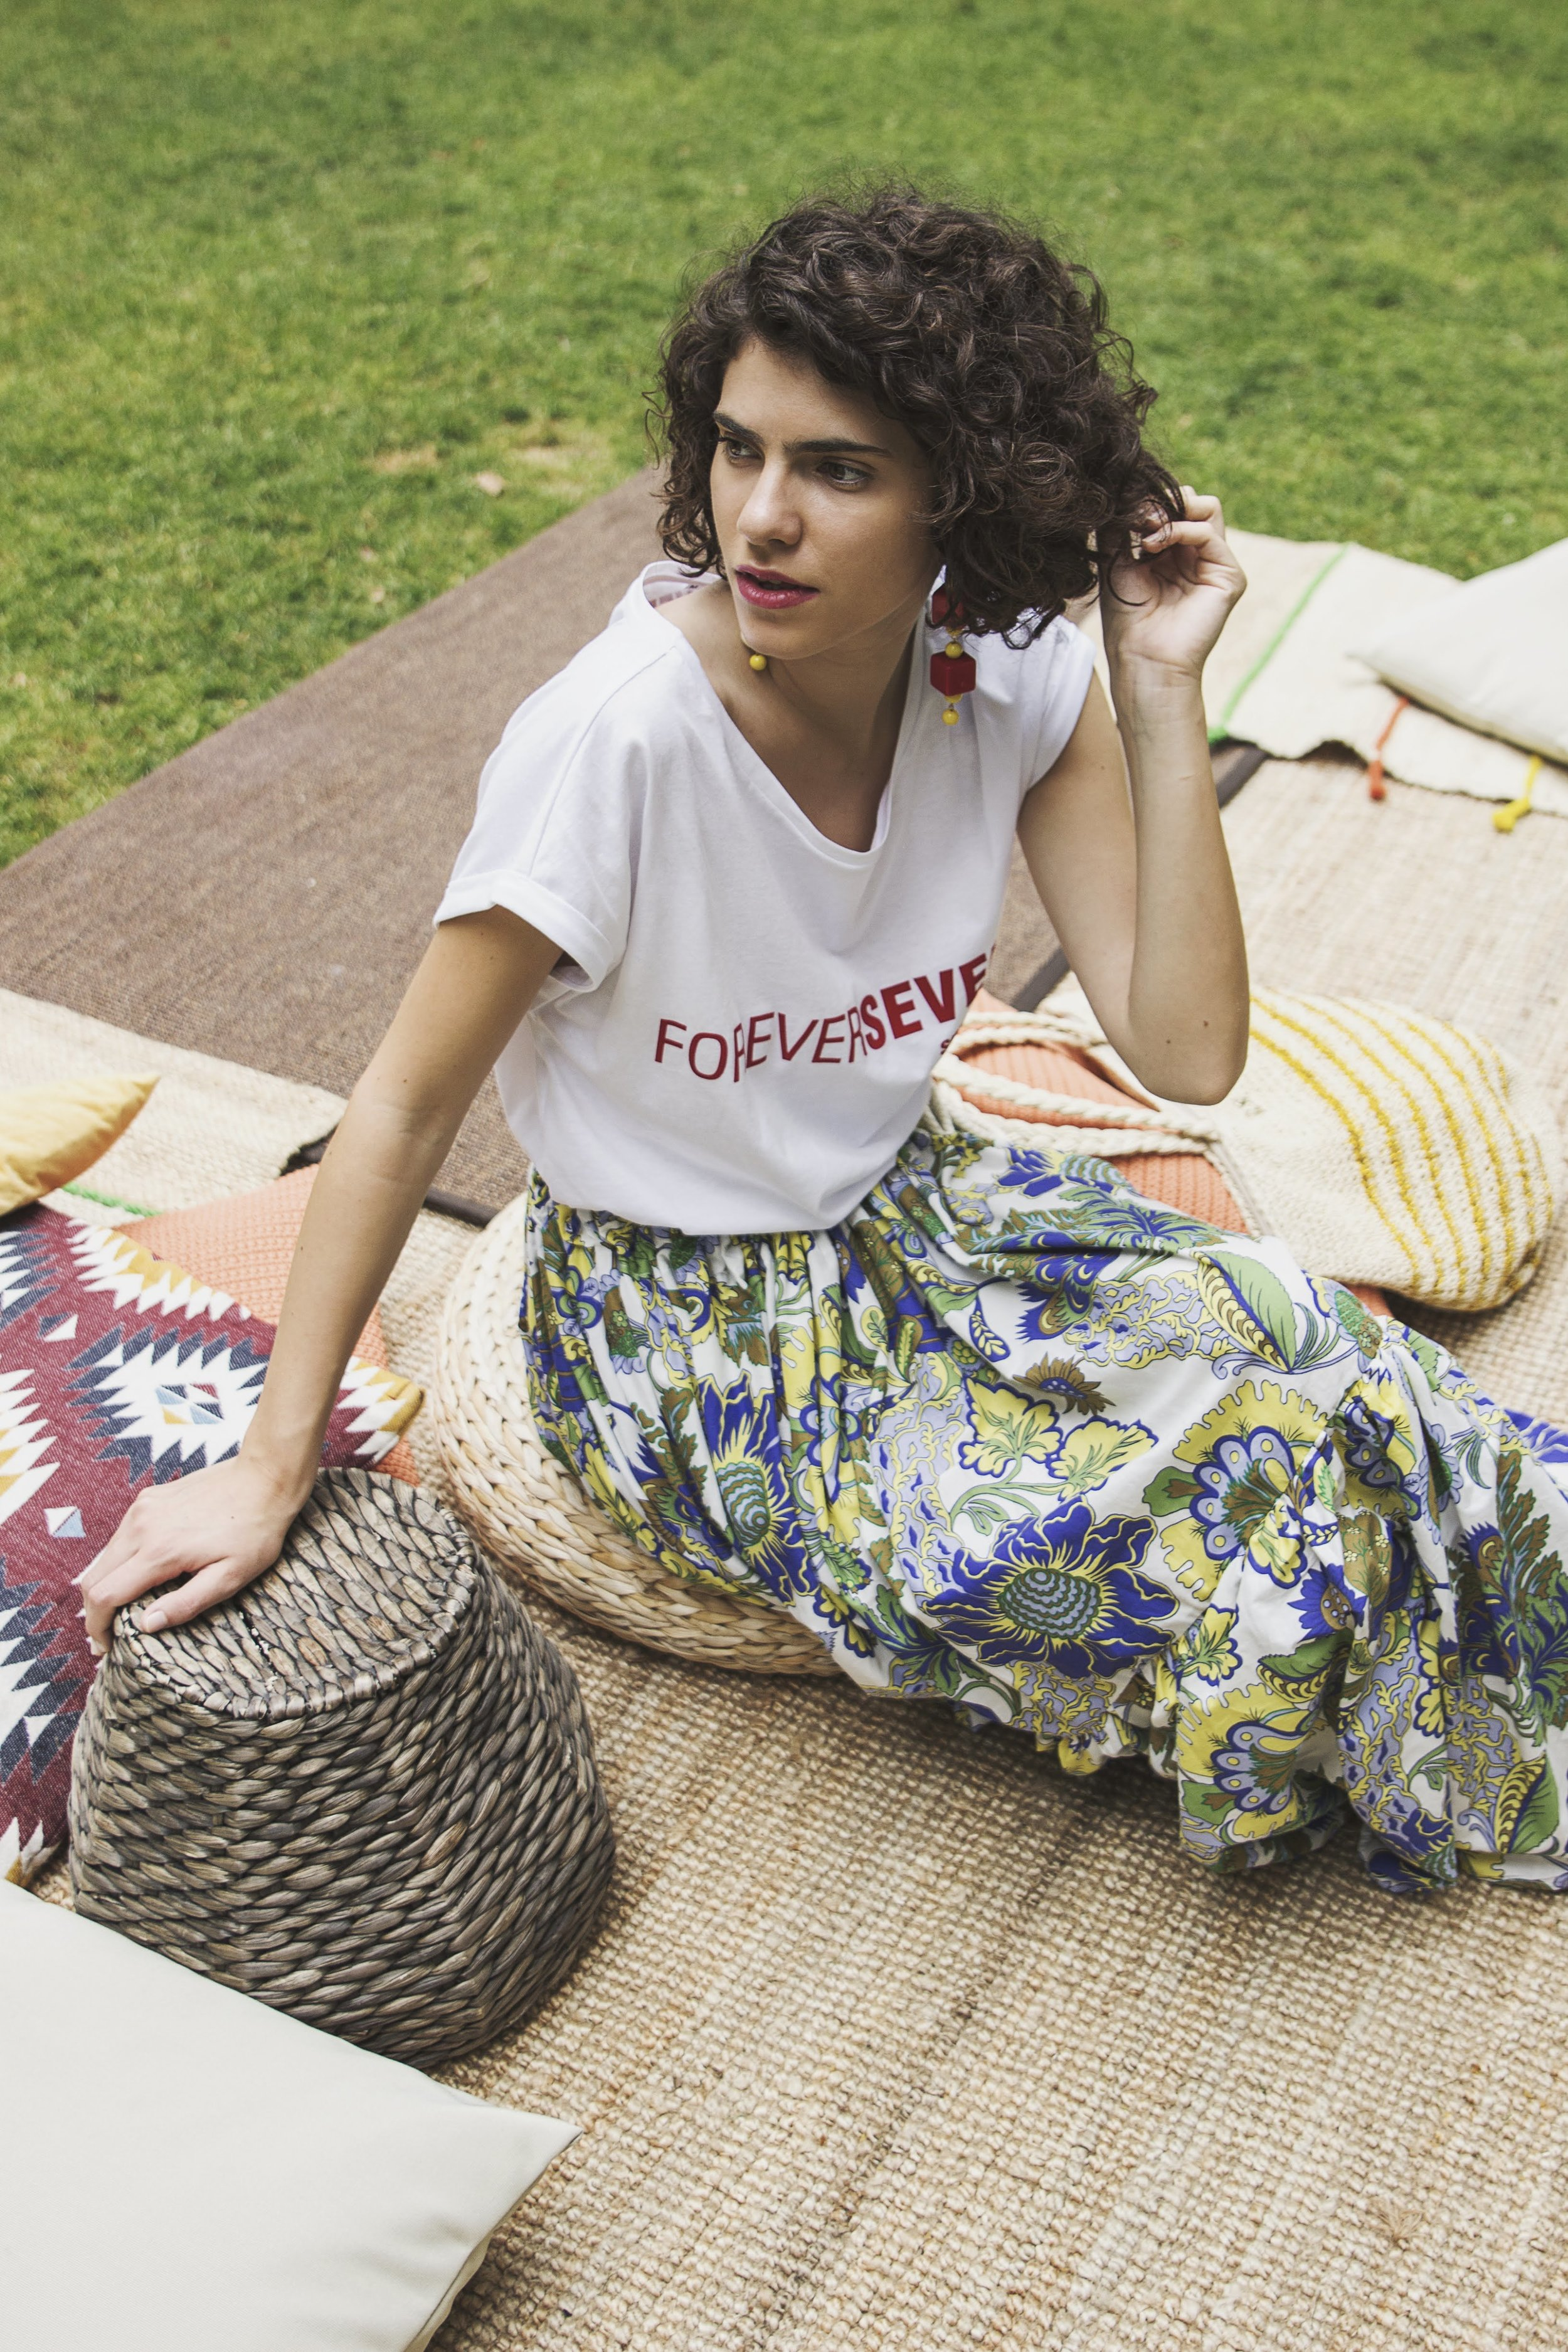 luka-lajic-fashion-photography-robert-sever-dizajner-croatian (21).jpg